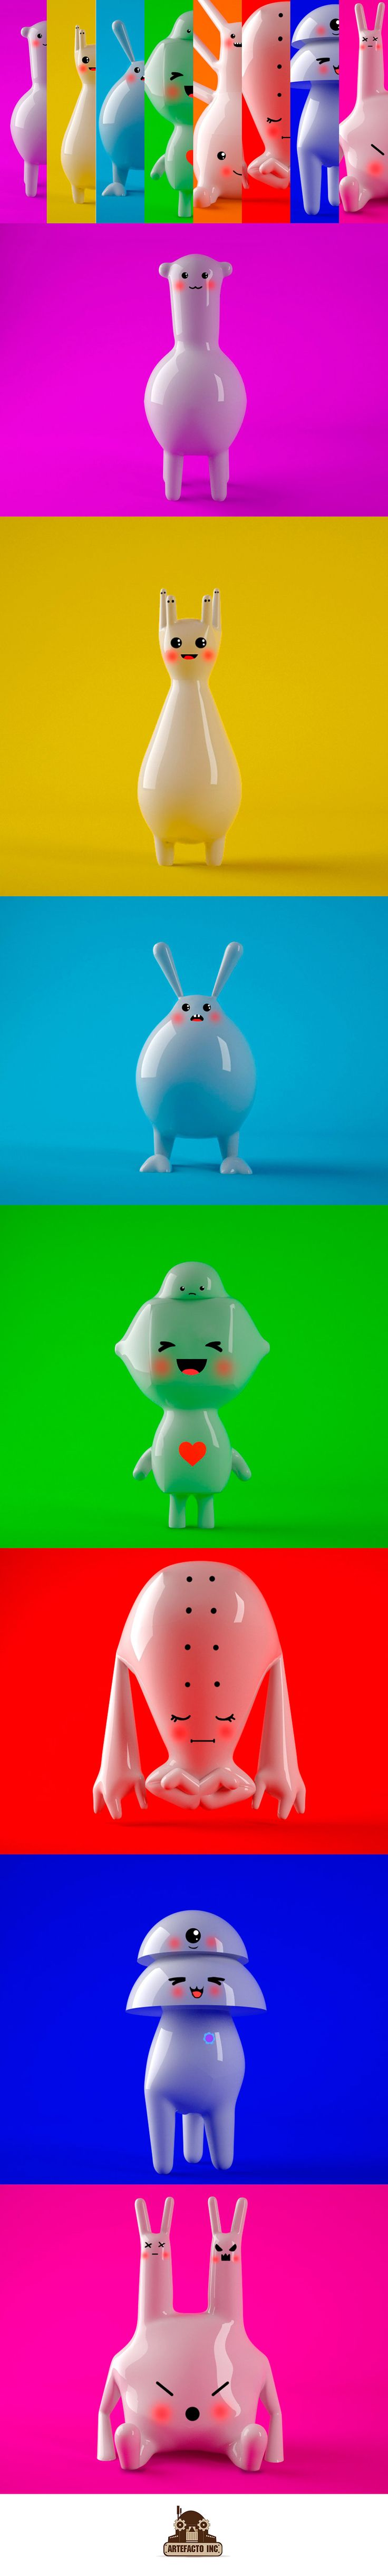 Familia feliz :) Art Toys on Behance